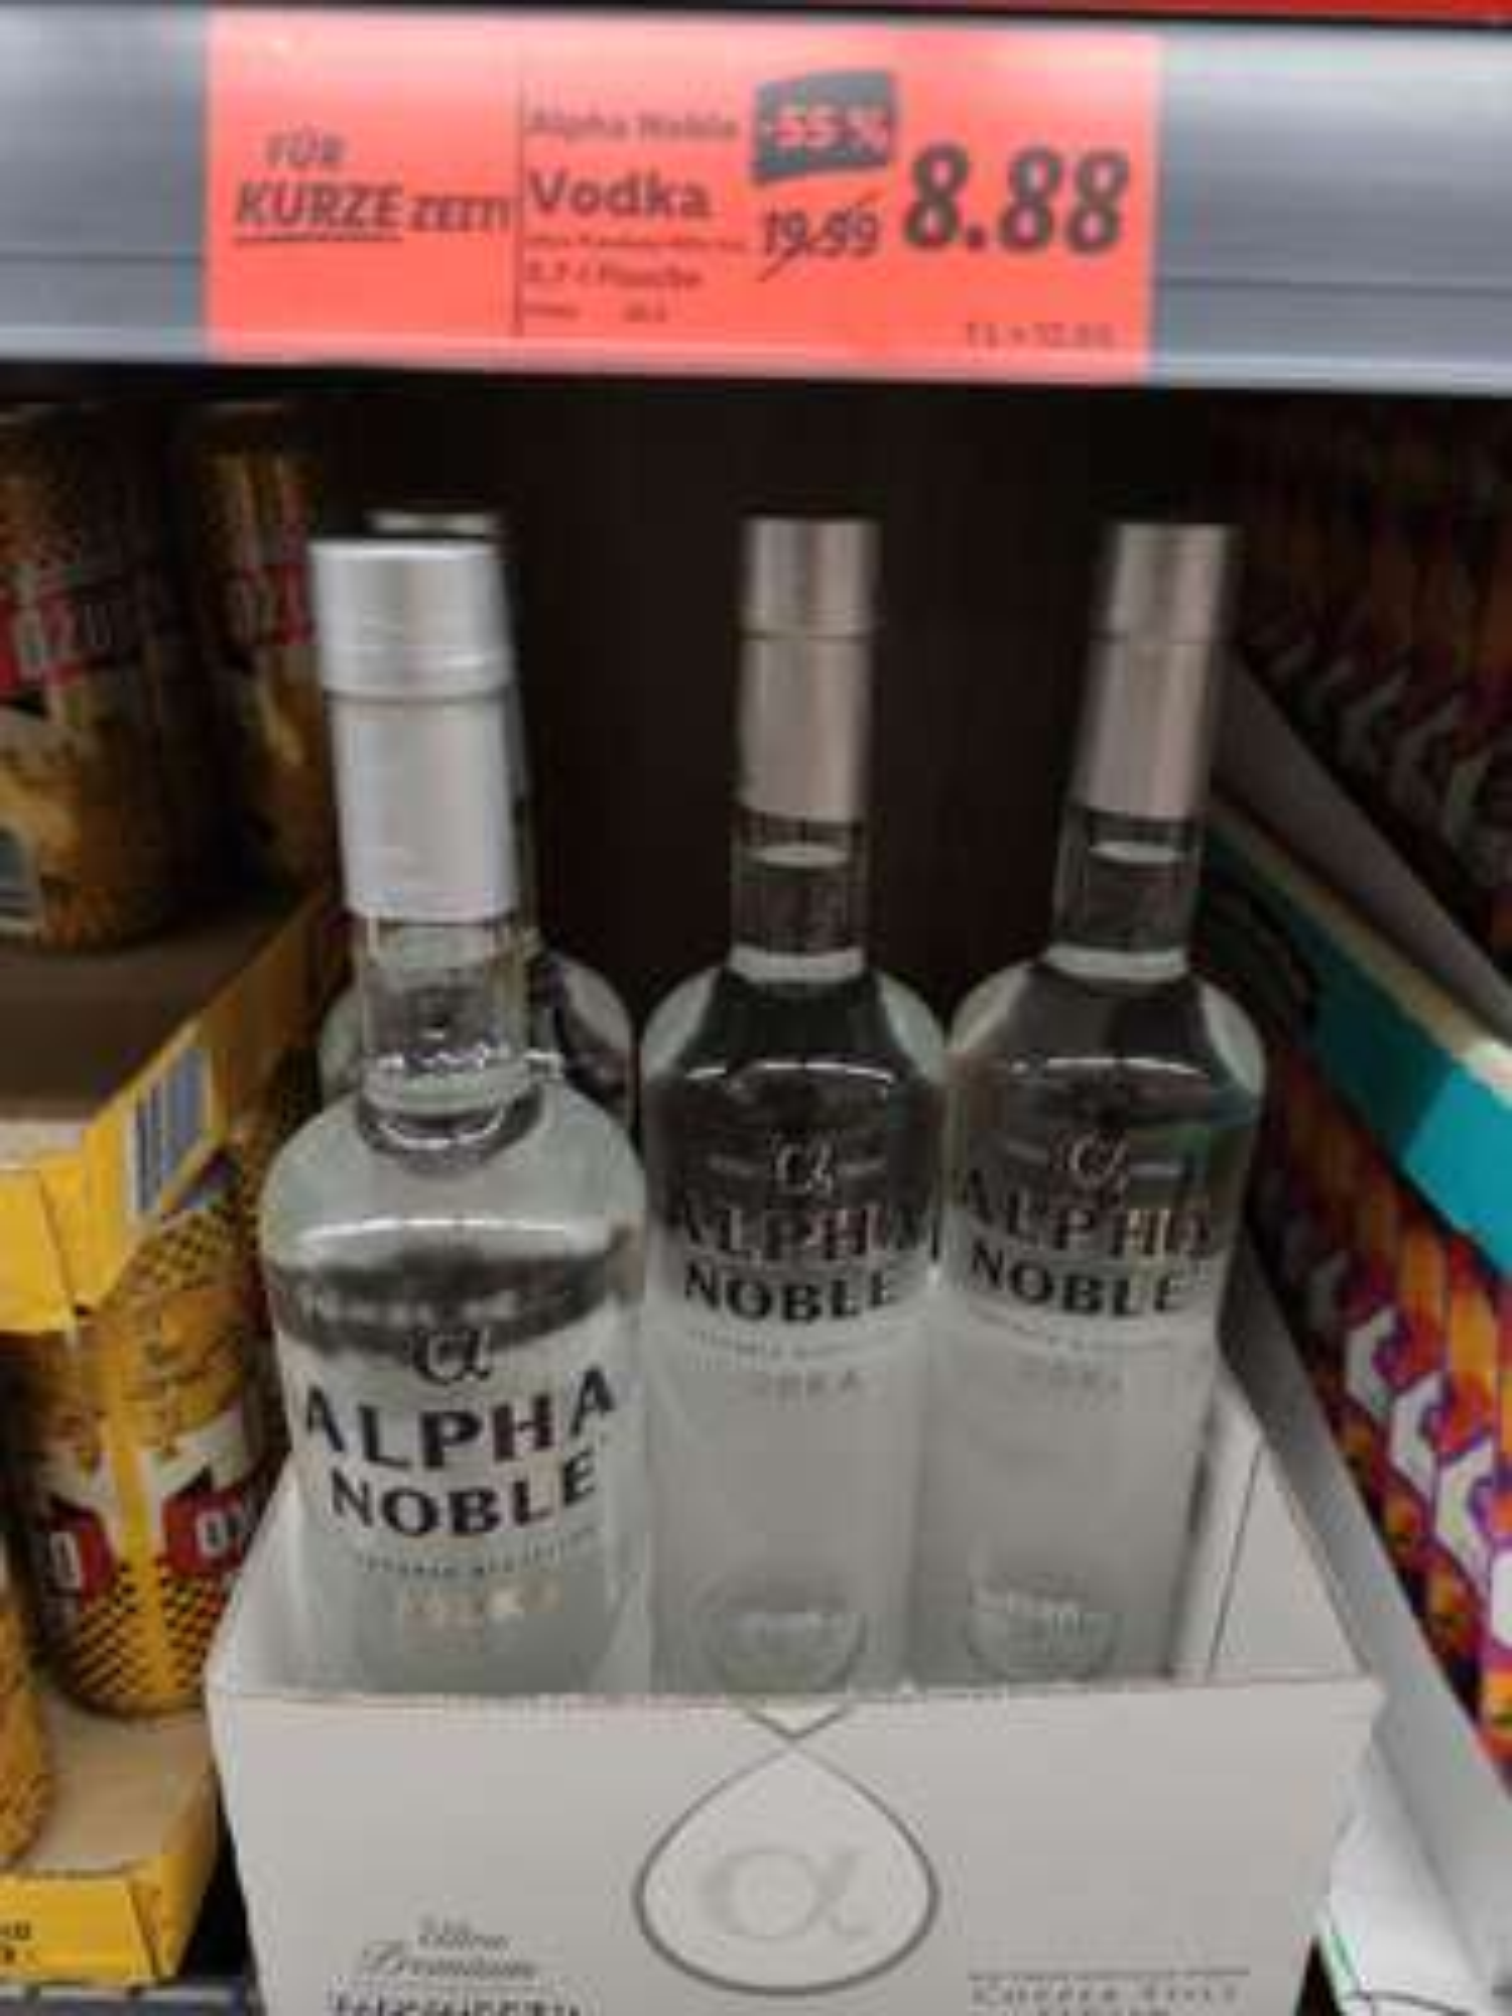 Alpha Noble Vodka 0,7L (Lidl bundesweit)